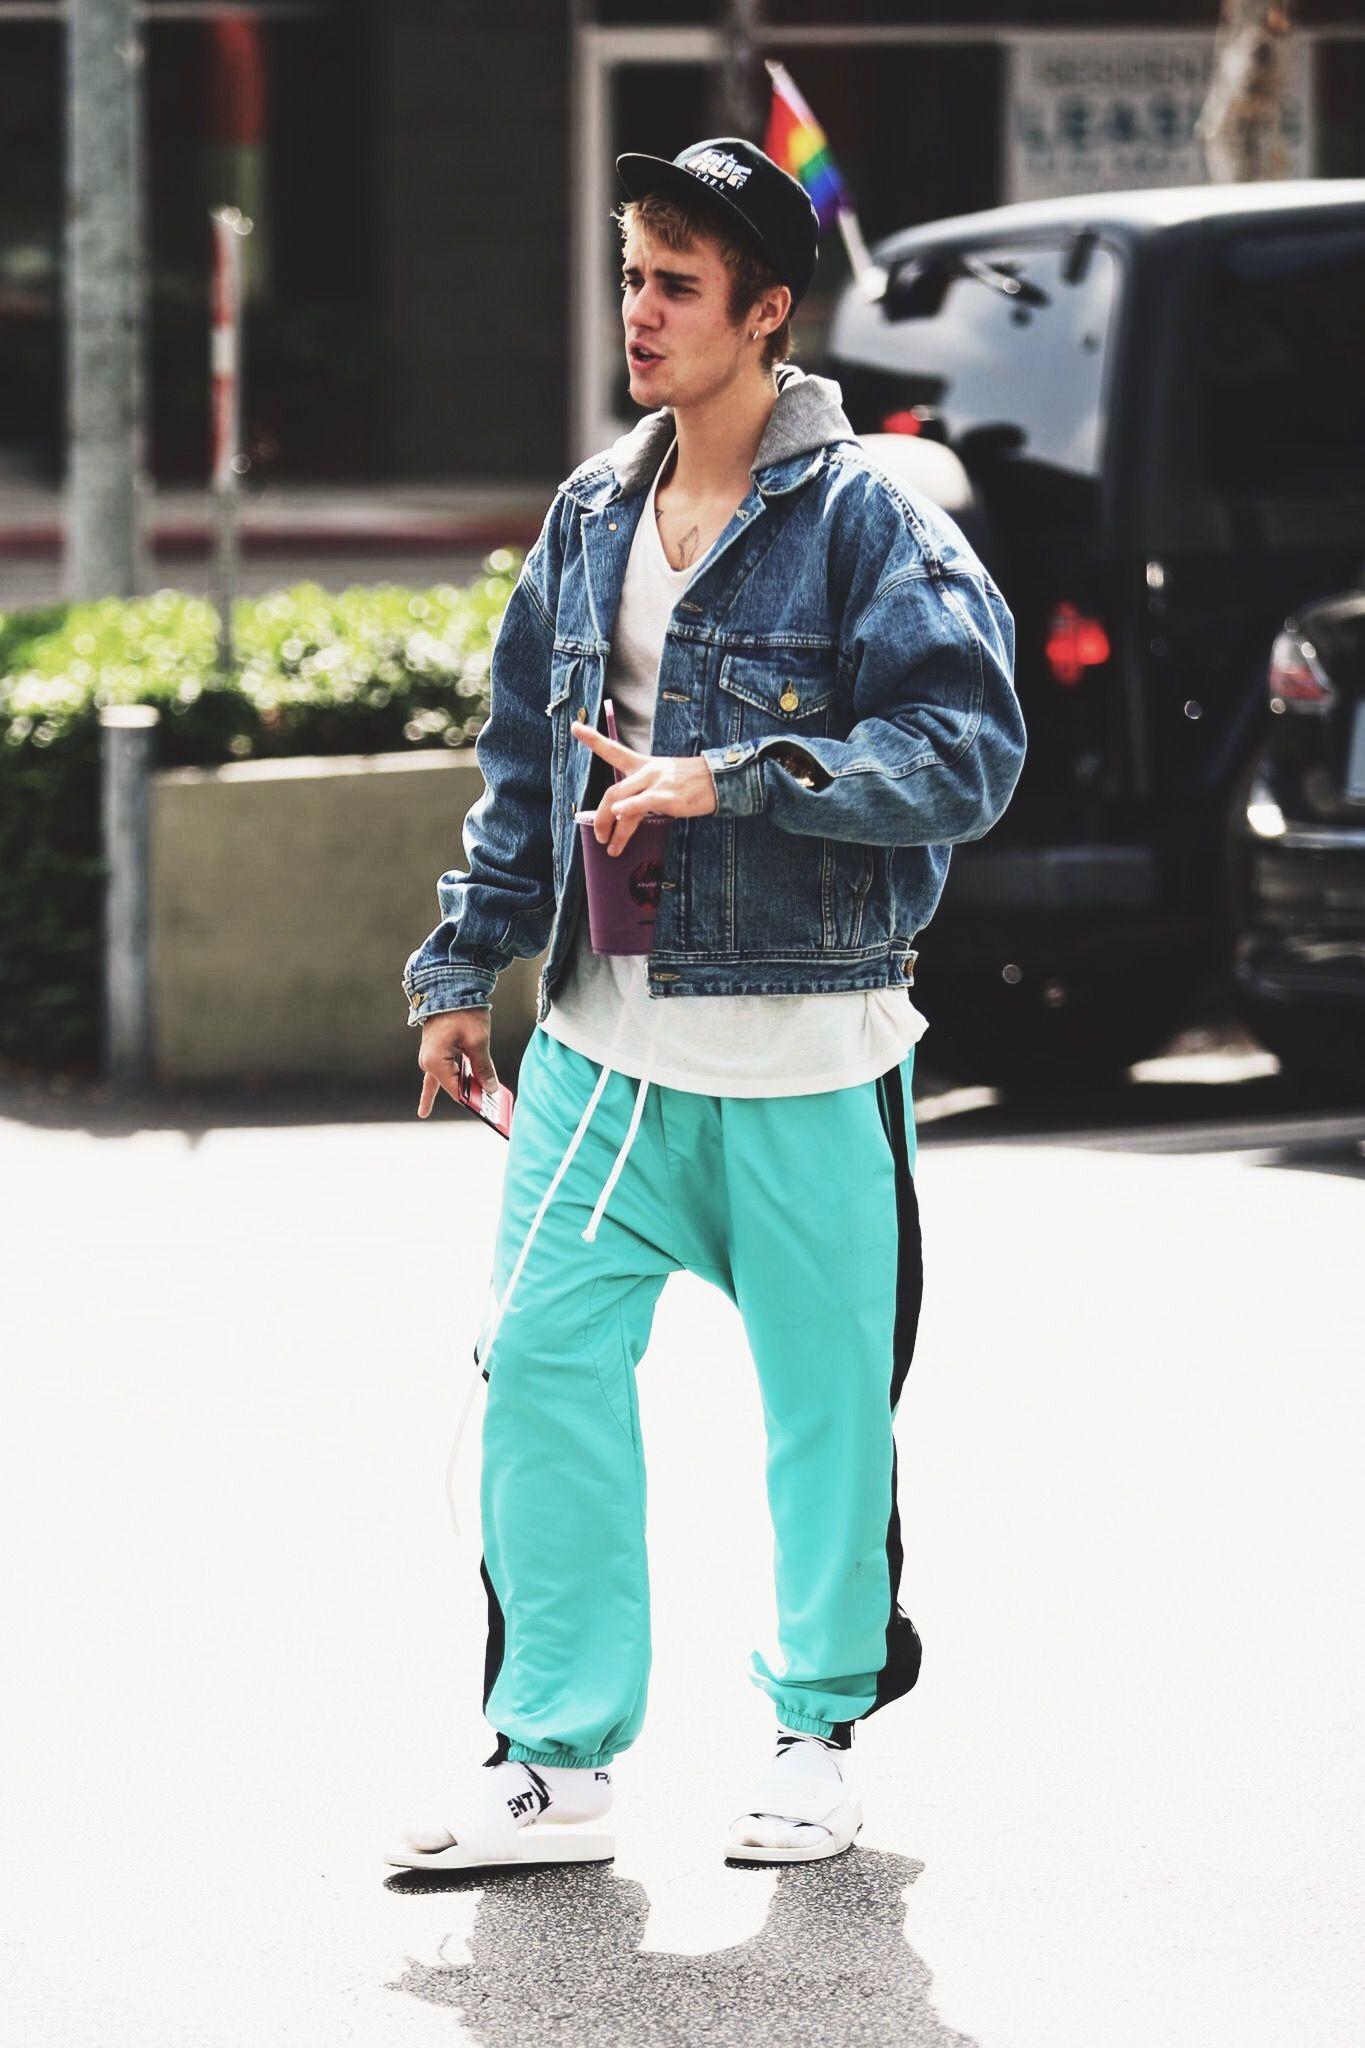 Justin Bieber Outfit 2017 Justin Bieber Pinterest Justin Bieber Outfits And Justin Bieber